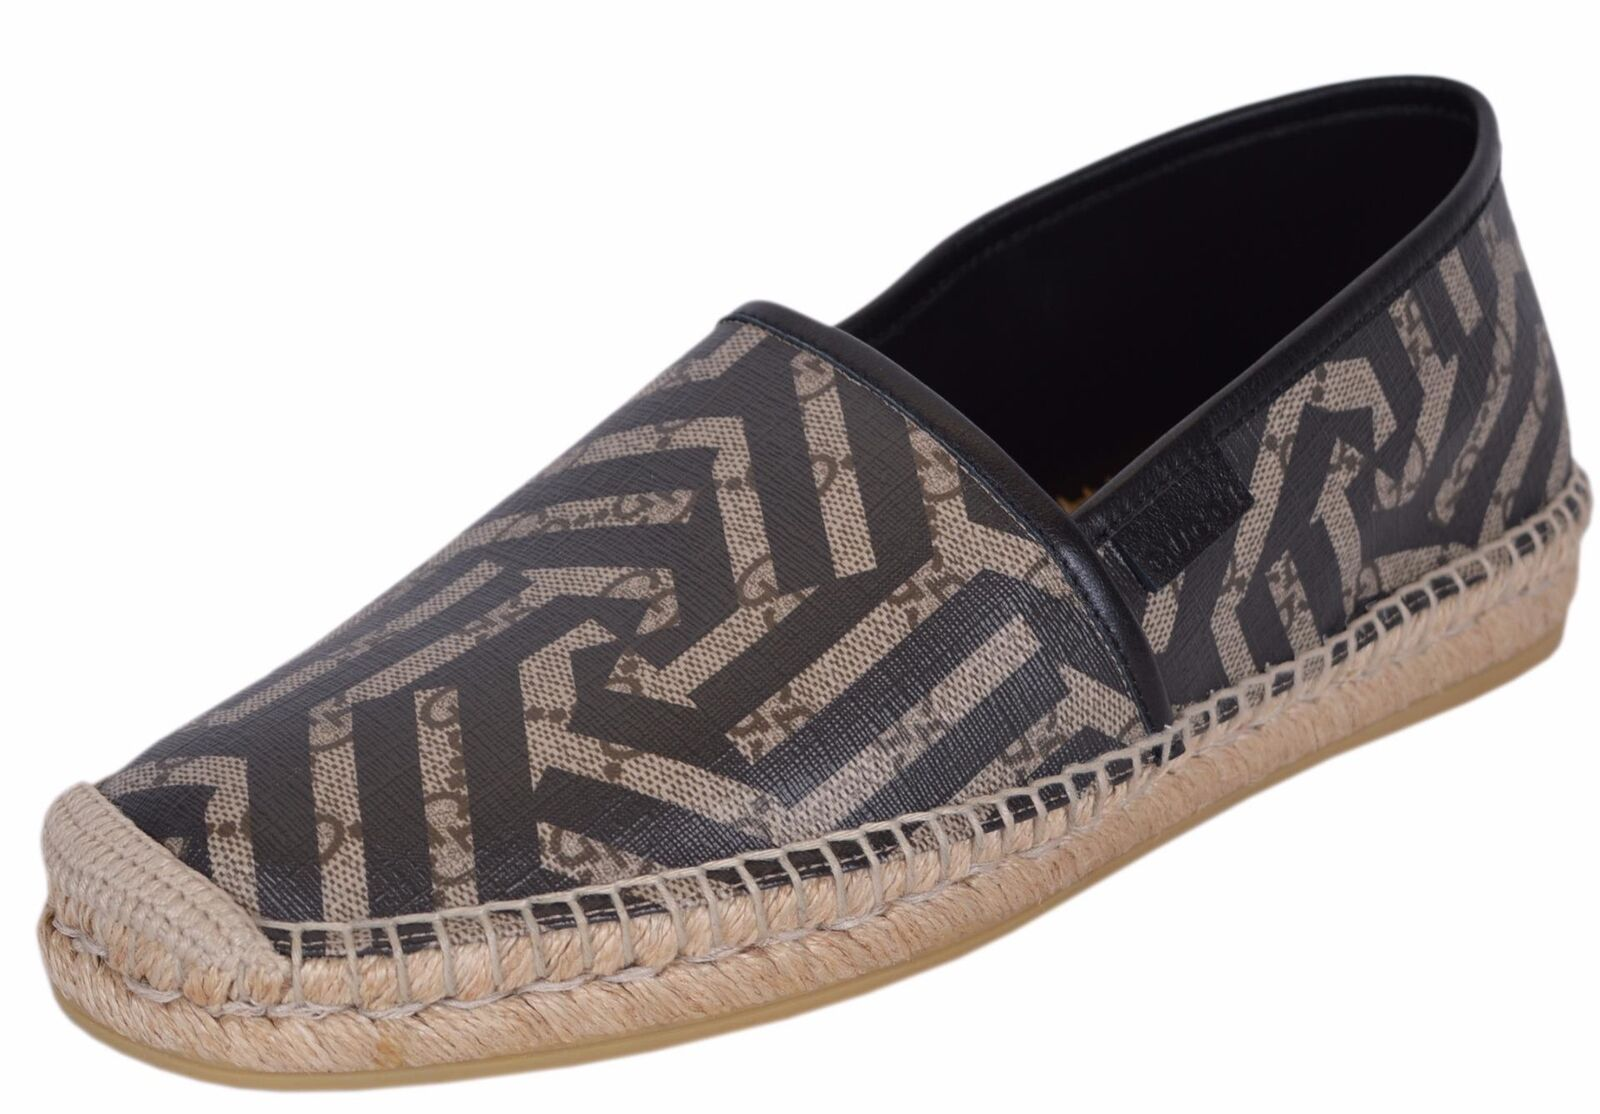 NEW Gucci Men's 407308 GG Supreme Canvas Kaleidoscope Espadrilles Shoes